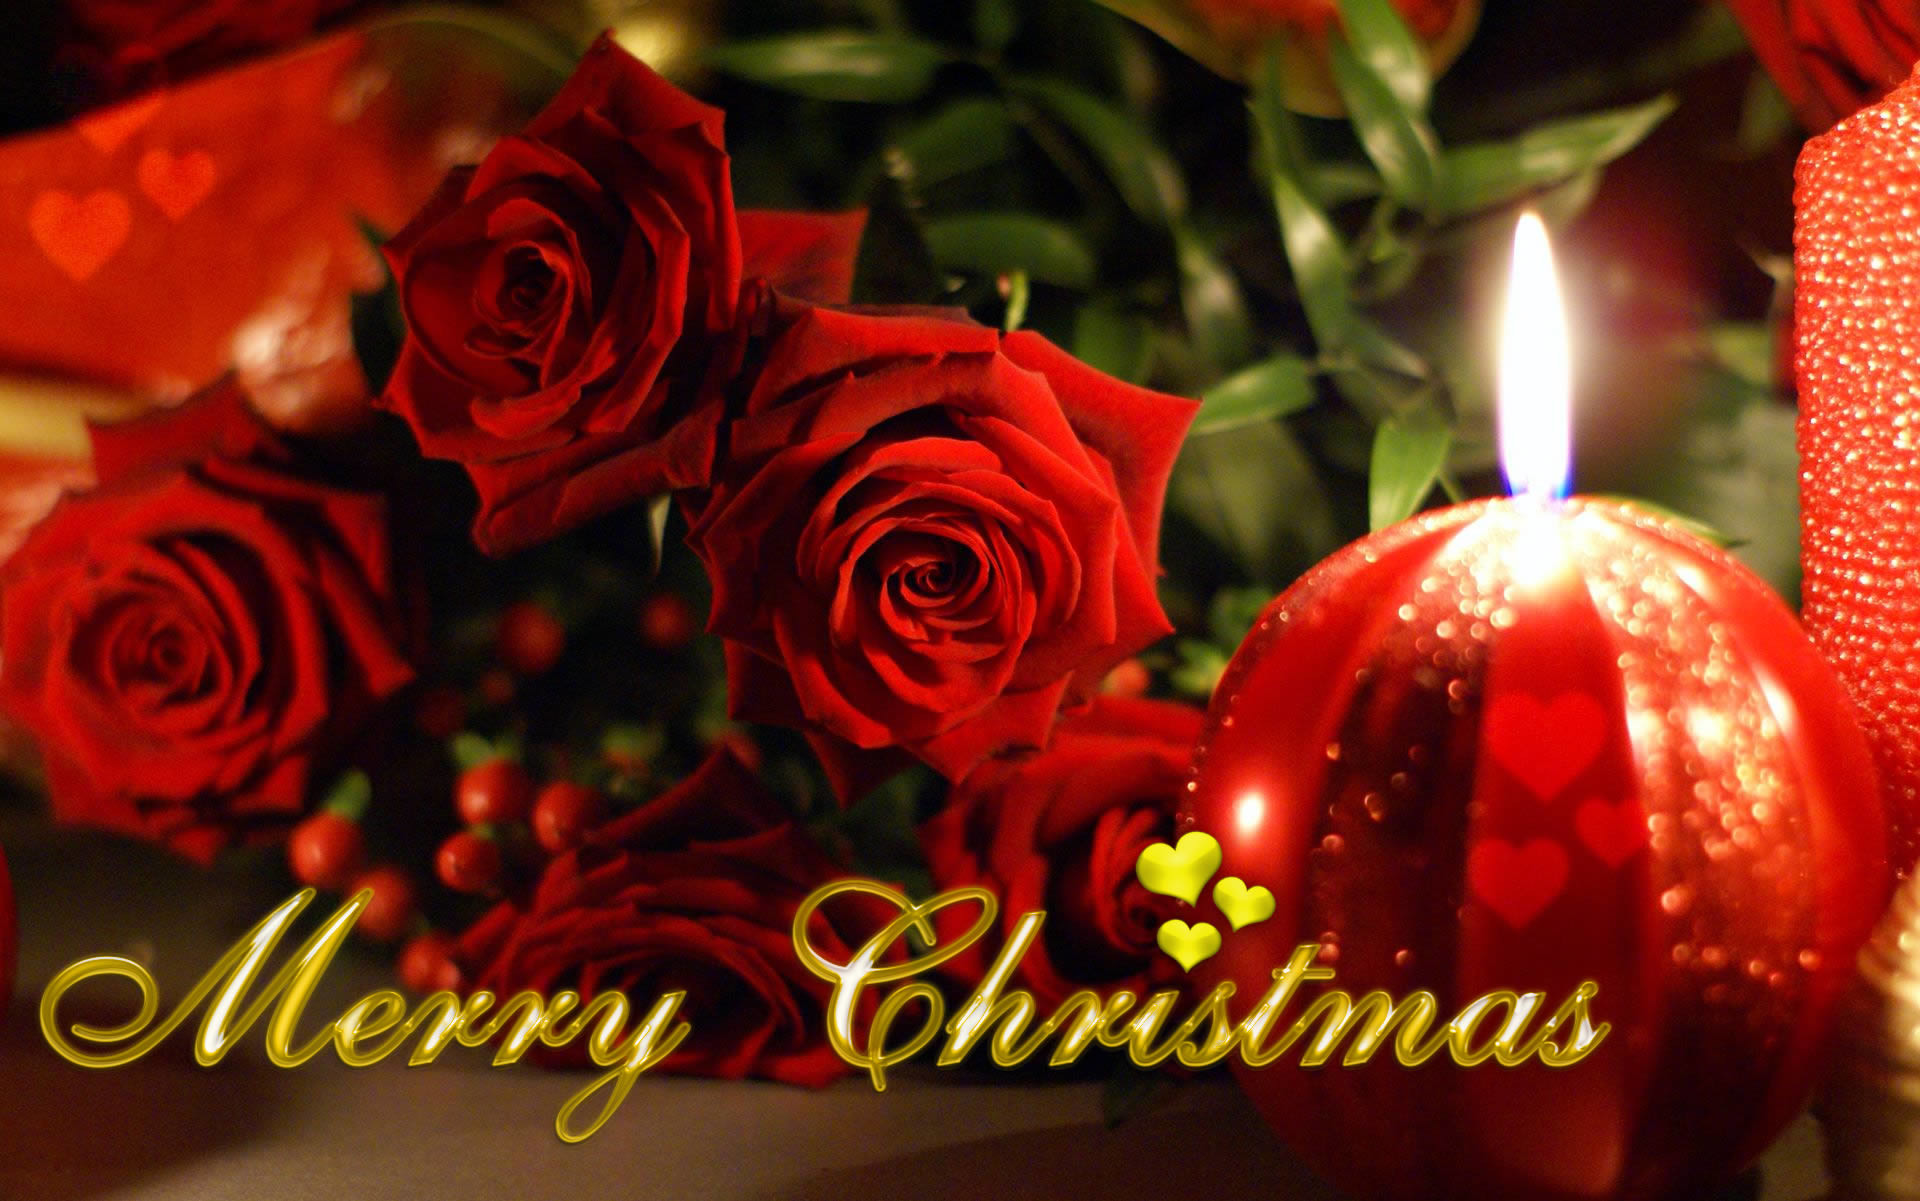 Merry Christmas Wallpaper HD Dowwnload.